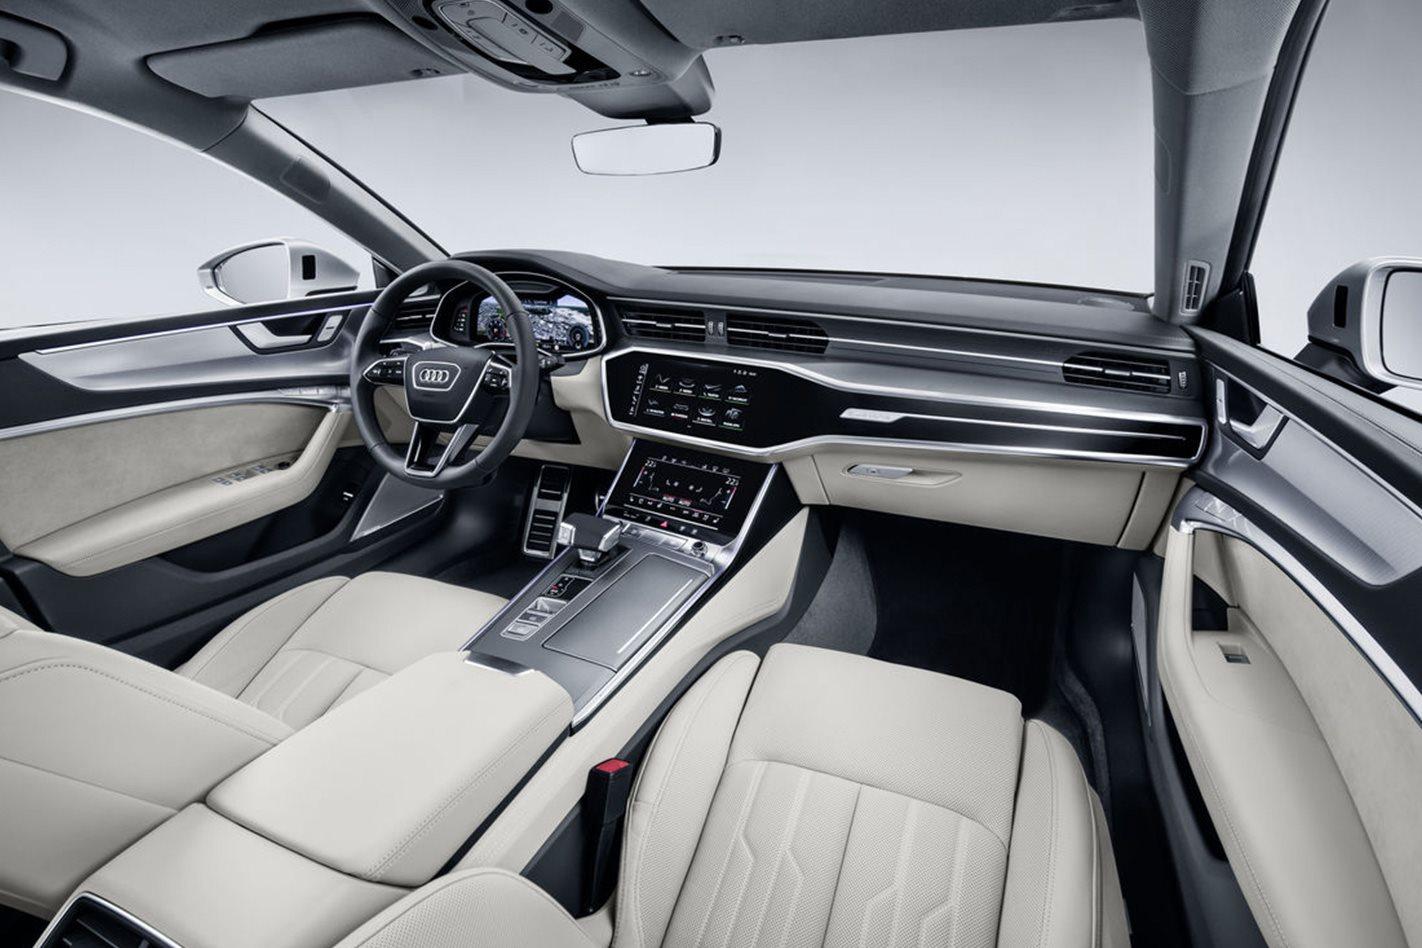 2019-Audi-A7-Sportback-interior.jpg